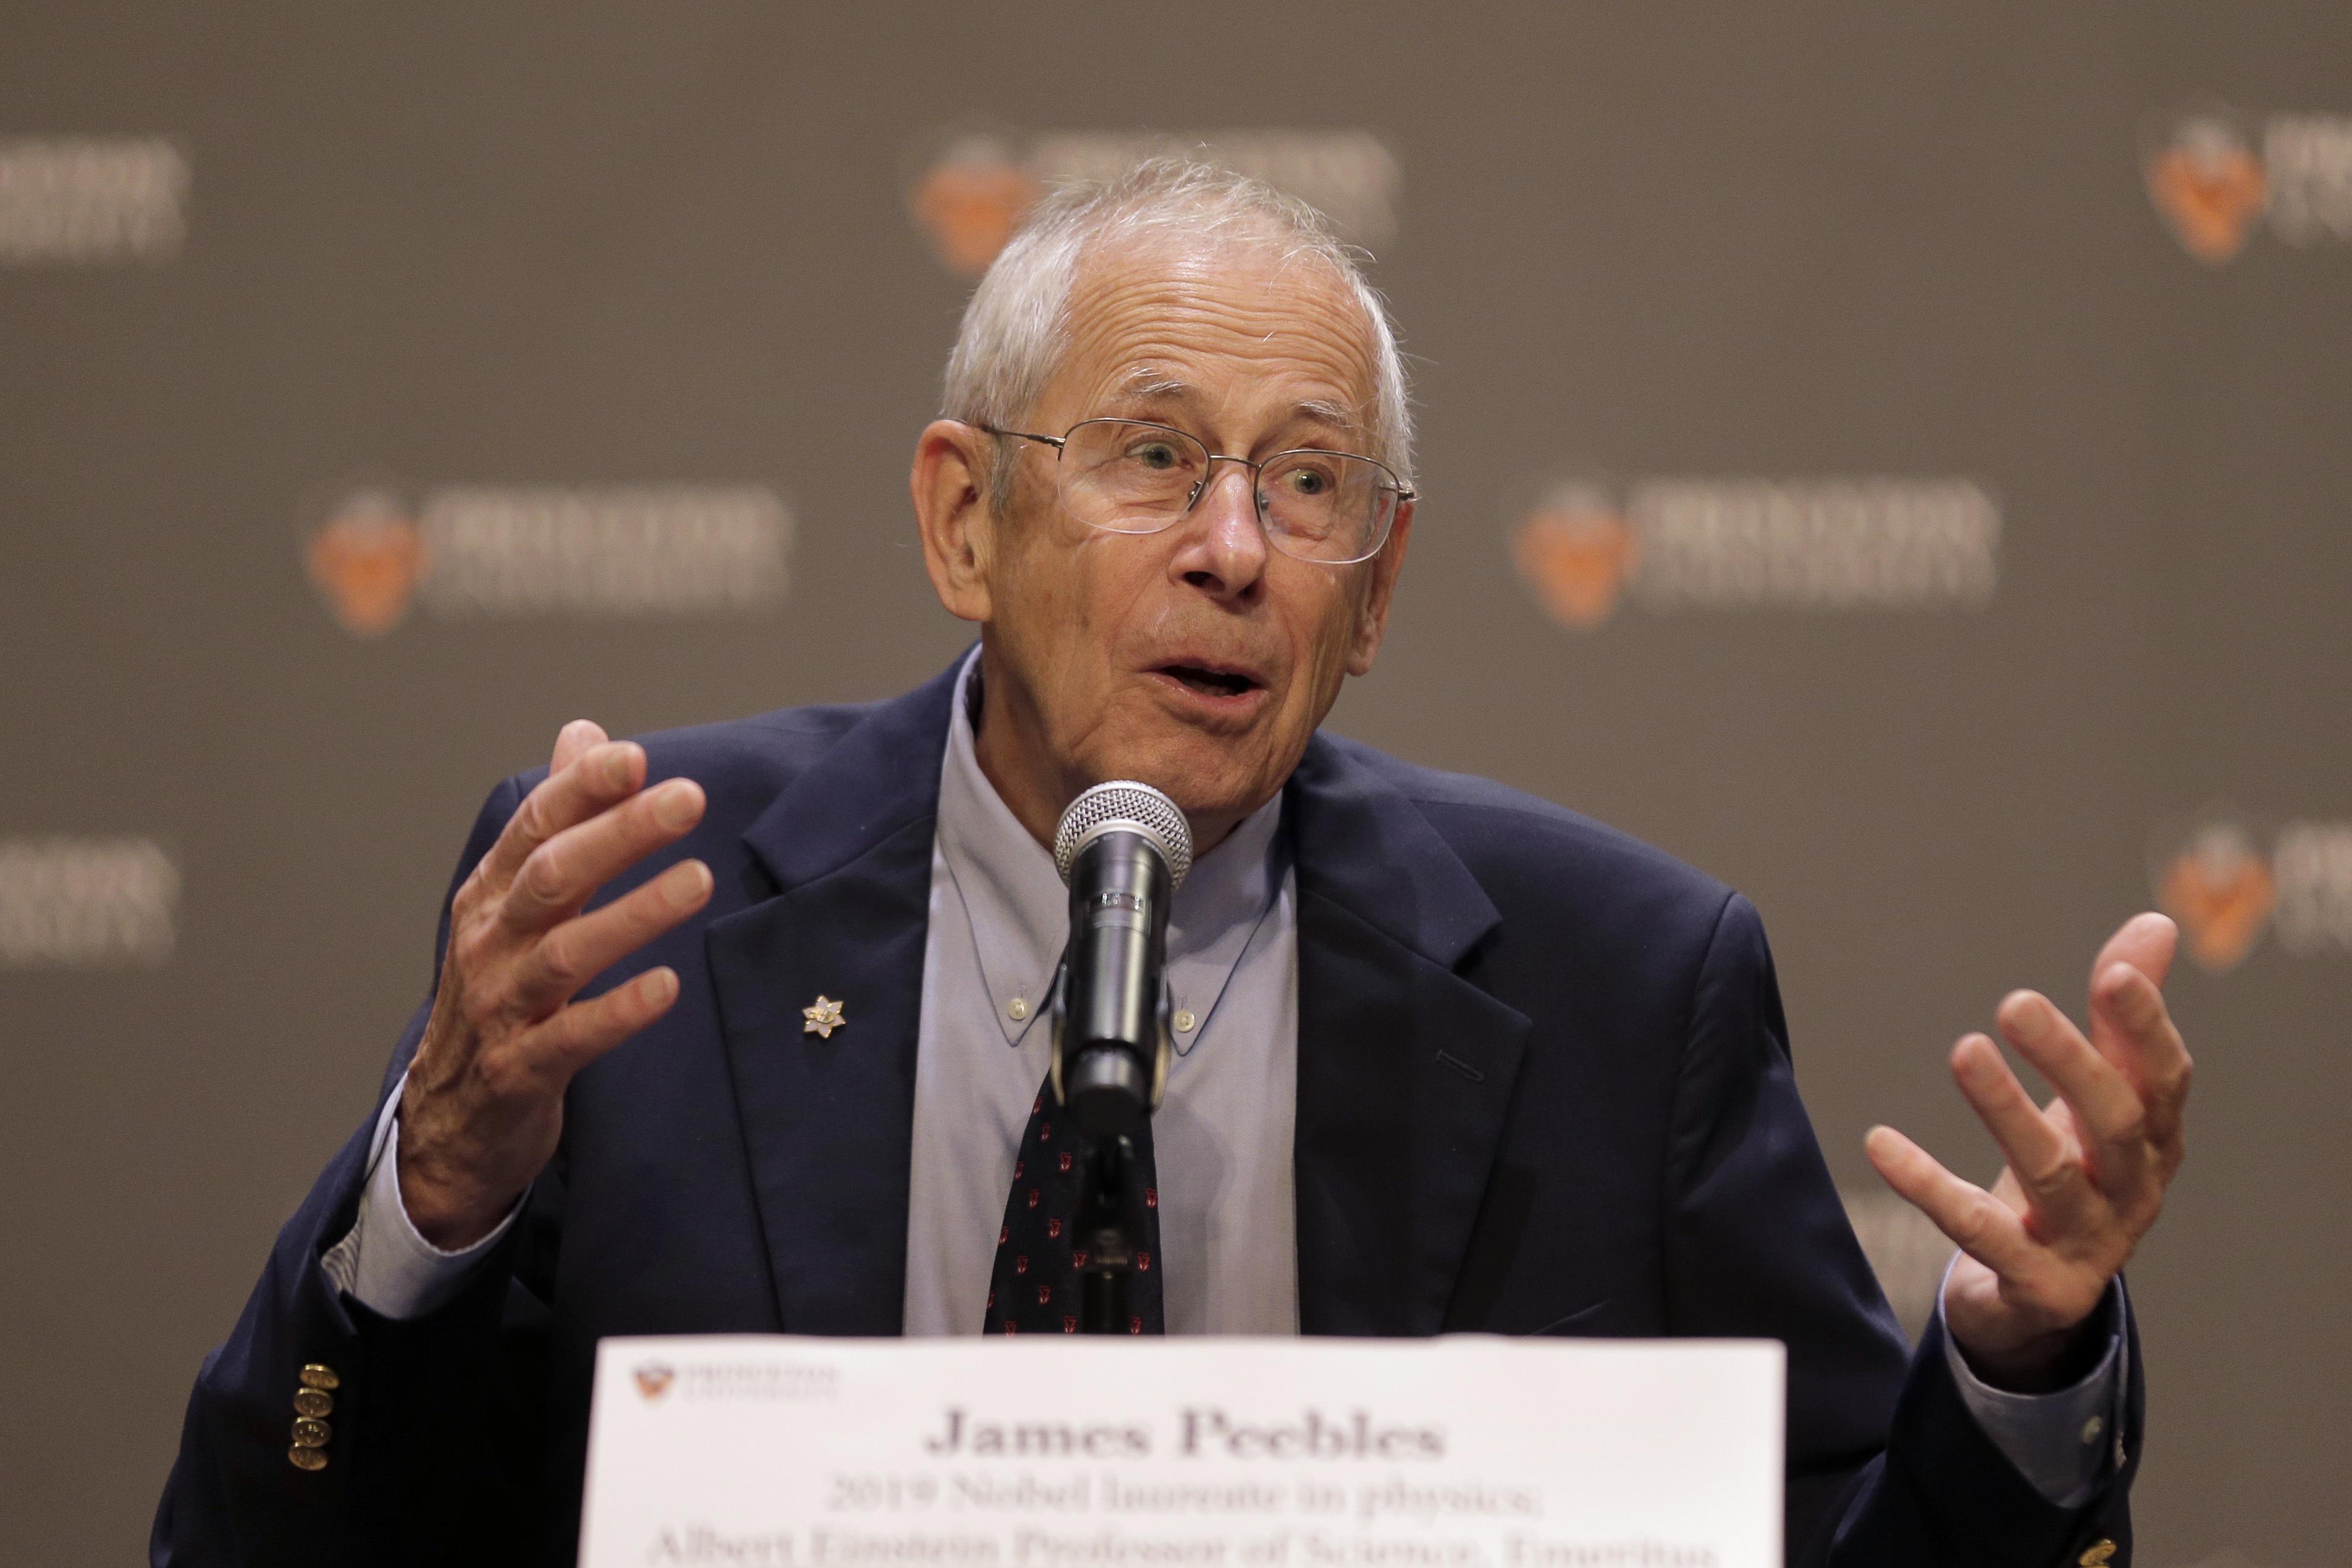 James Peebles